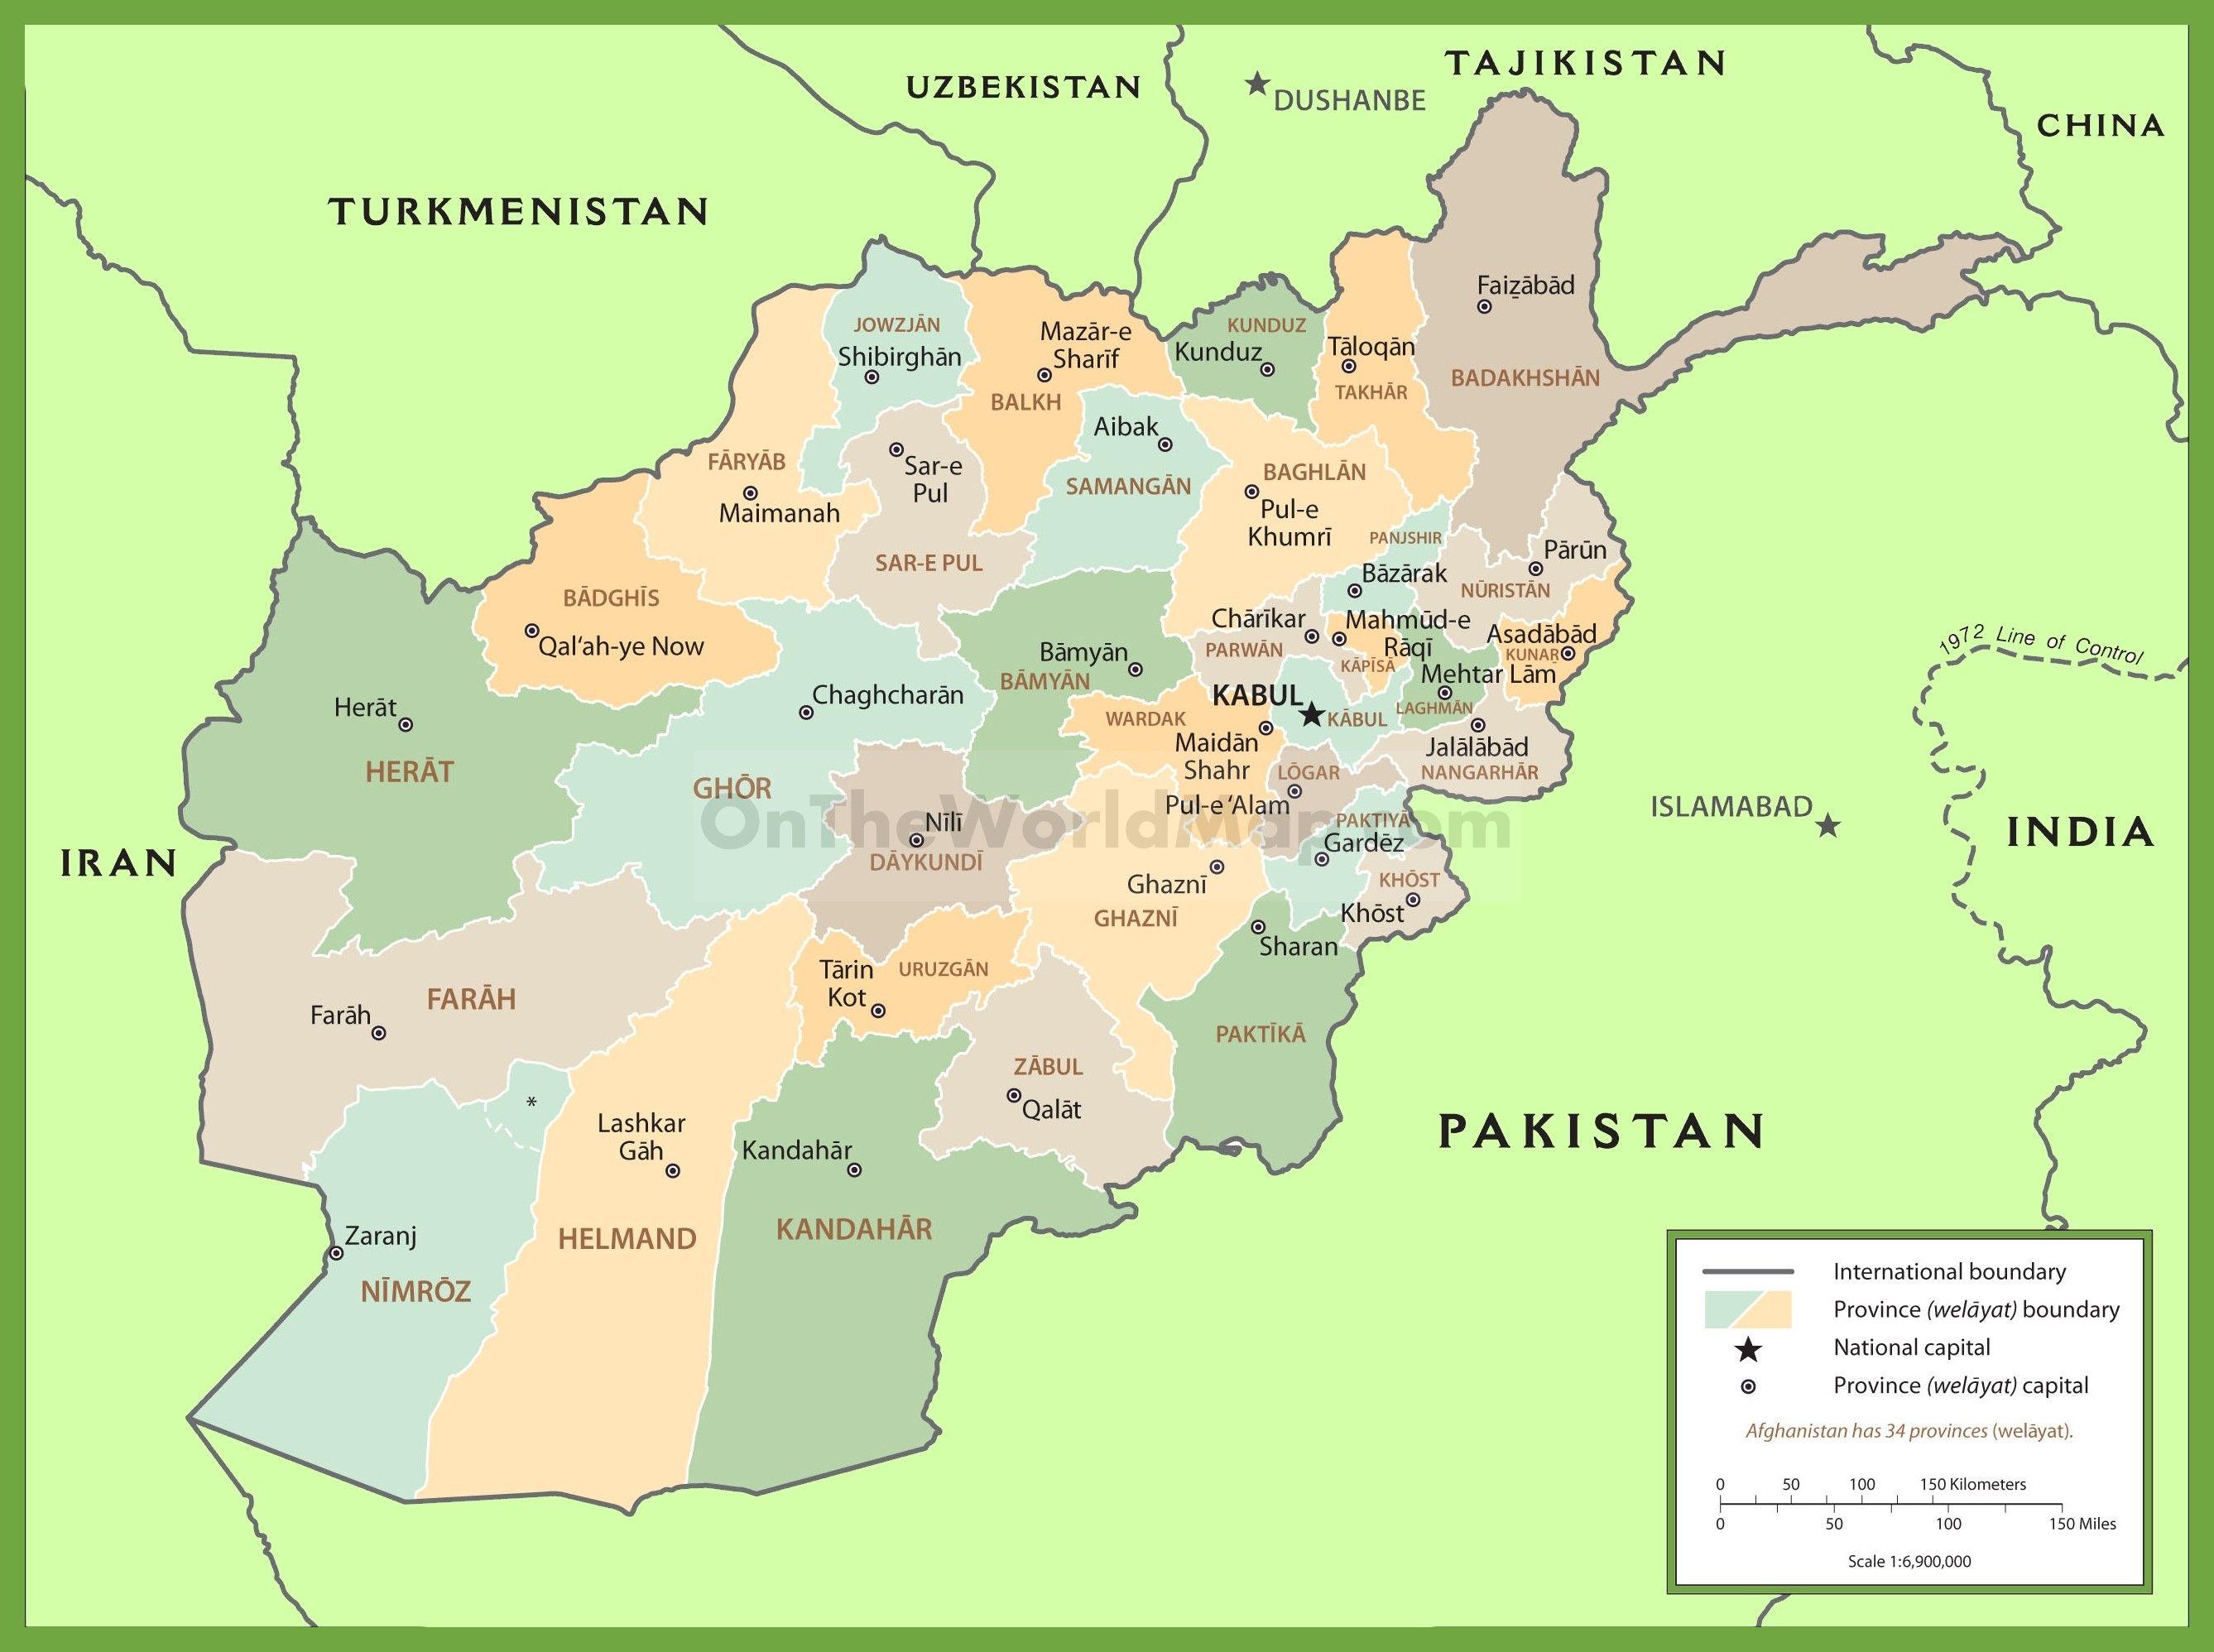 Pin by Hidayat Yousofzai on MAp | Afghanistan, Cart, Map